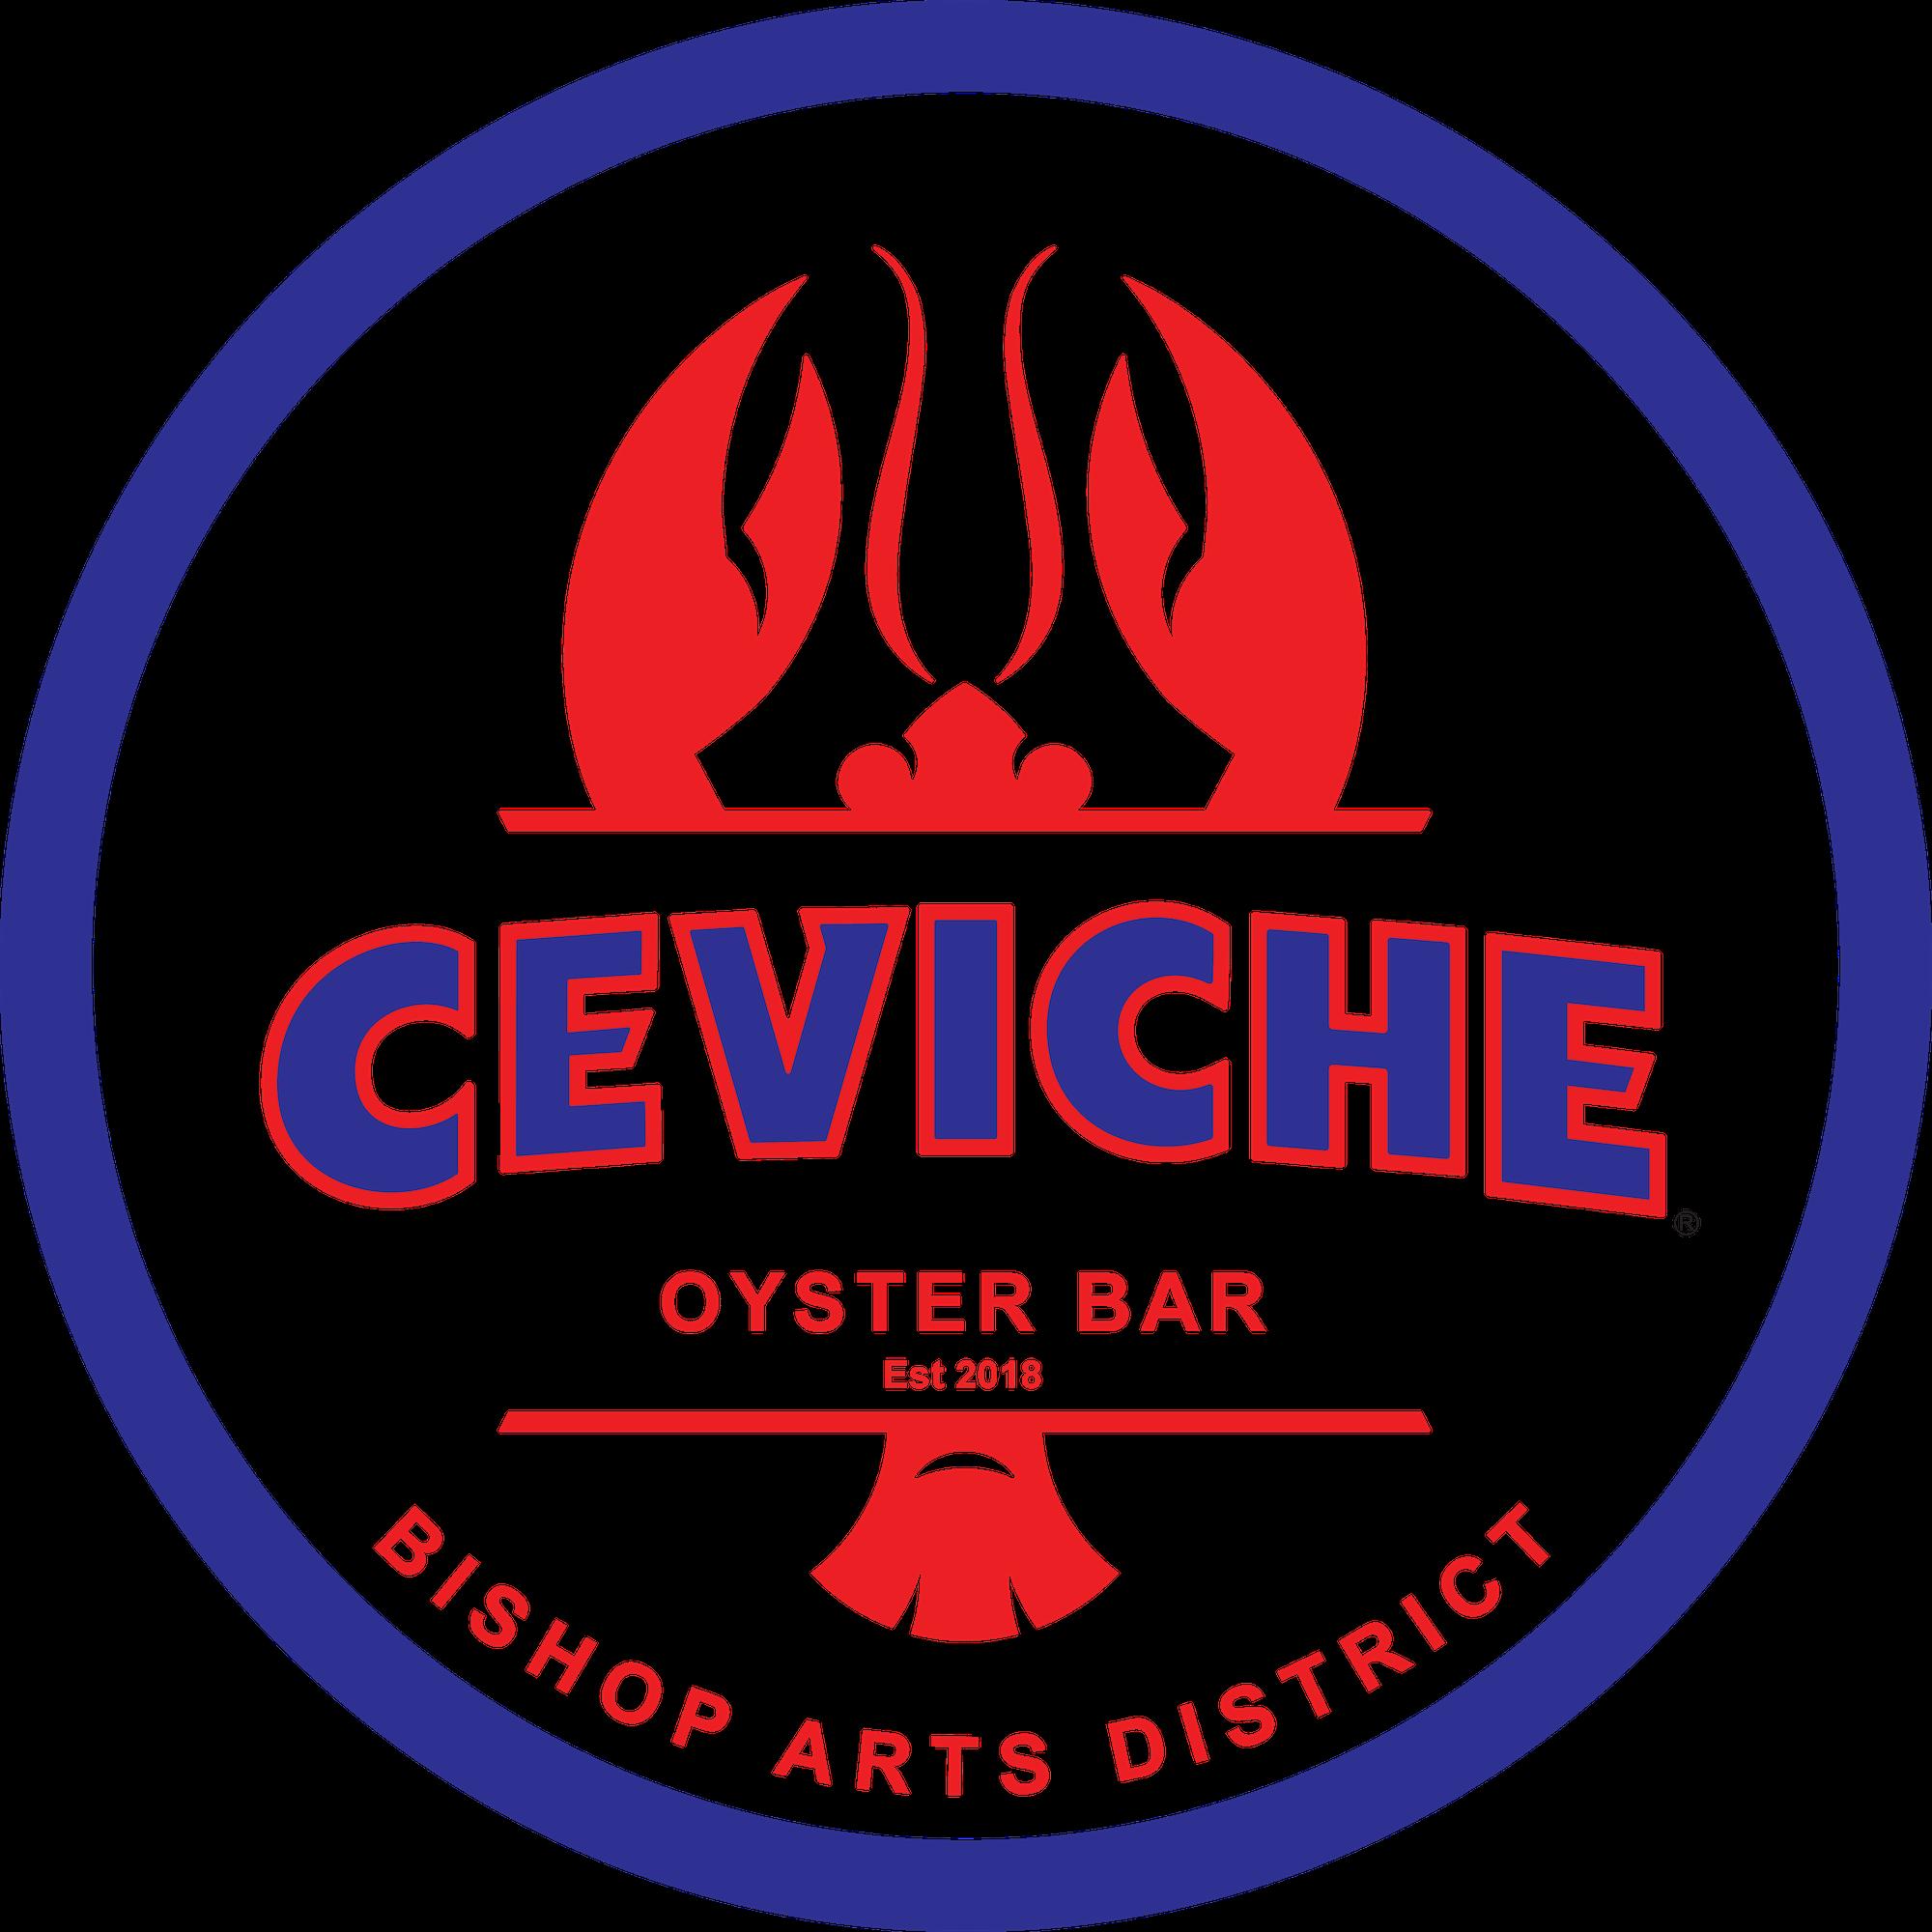 Ceviche Oyster Bar